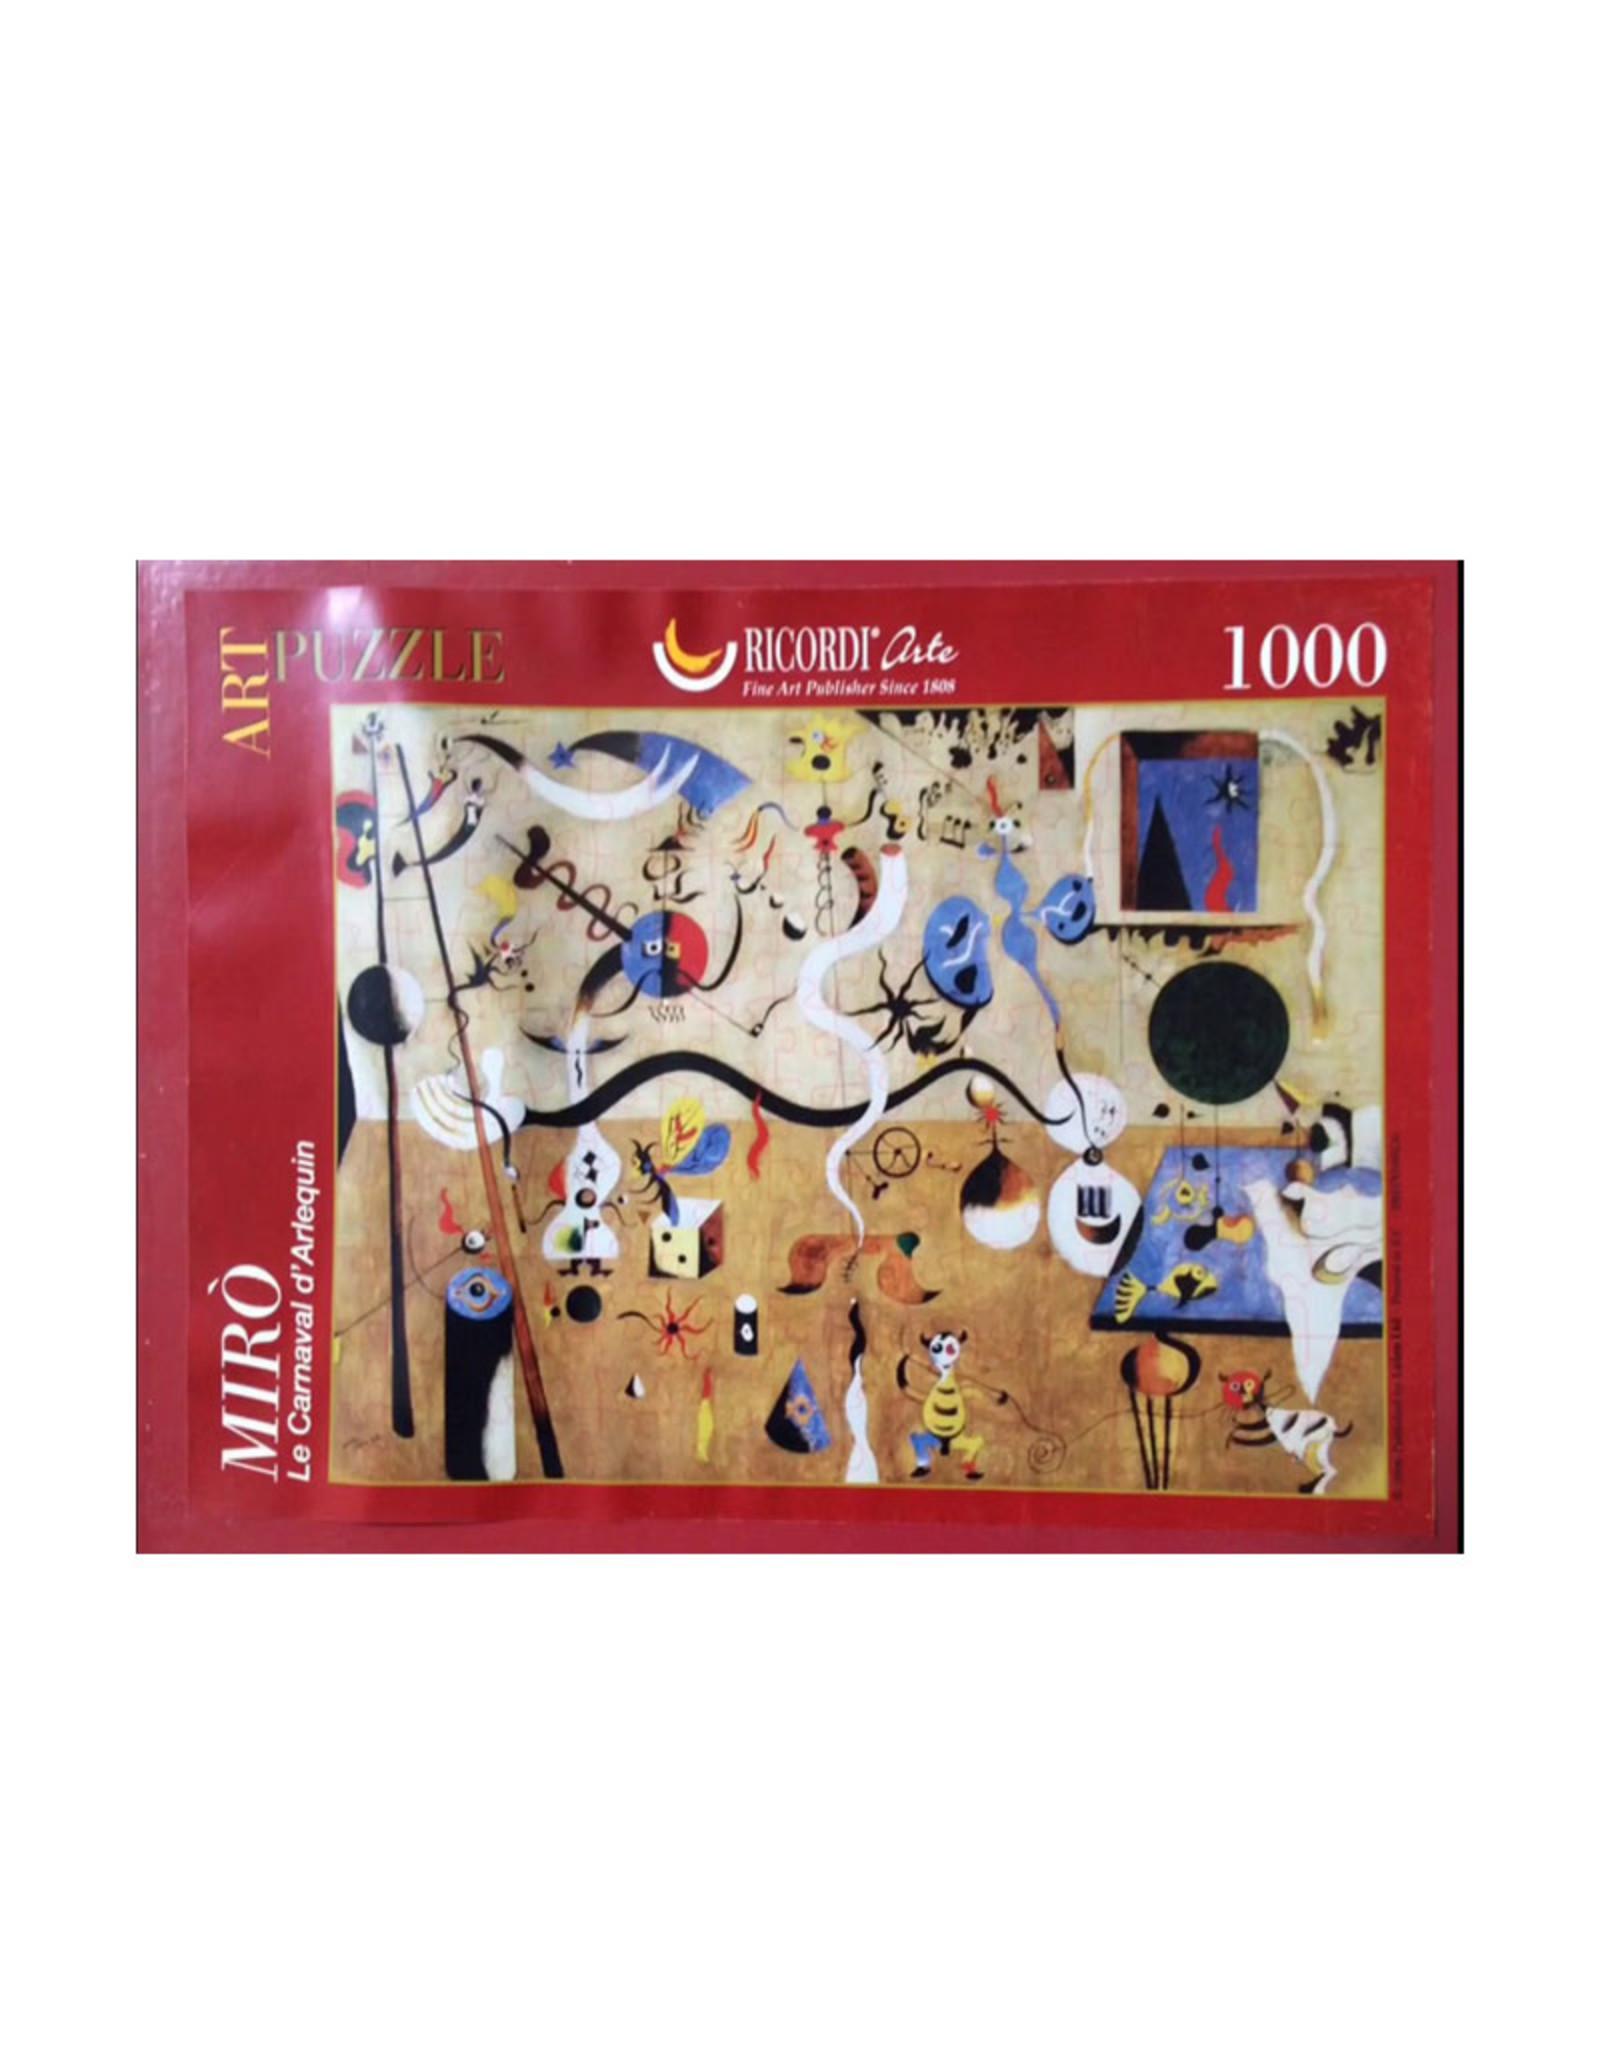 Clementoni Carnaval DArlequin1 1000 PCS (Miro)